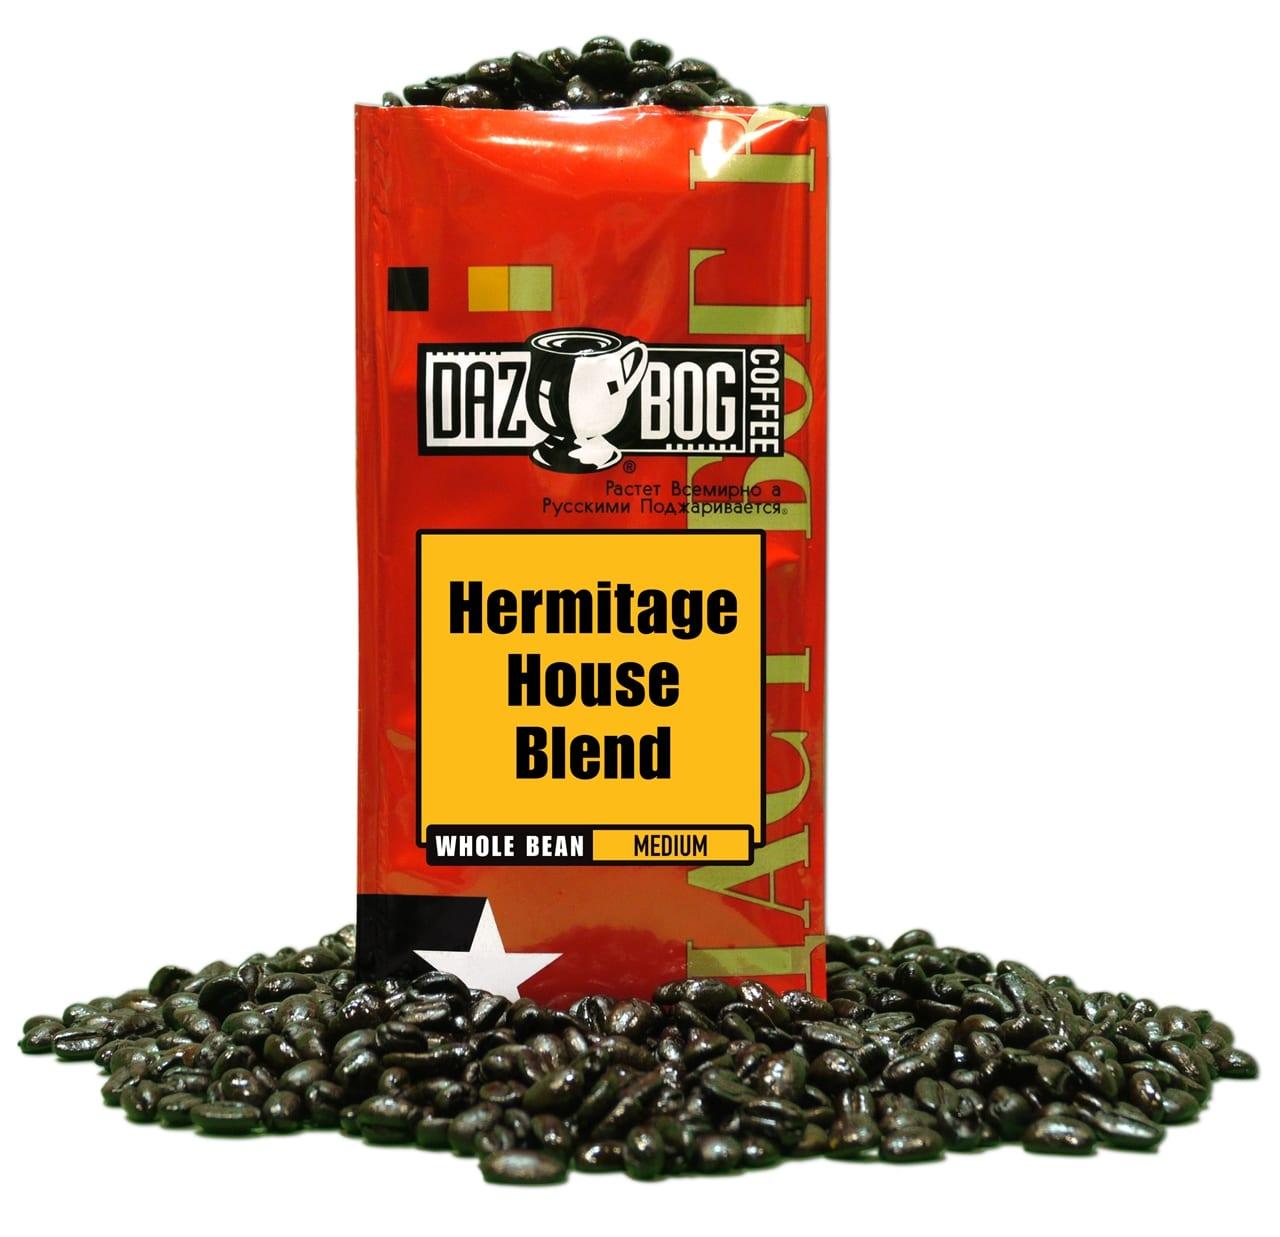 Hermitage house blend dazbog coffee for Hermitage house